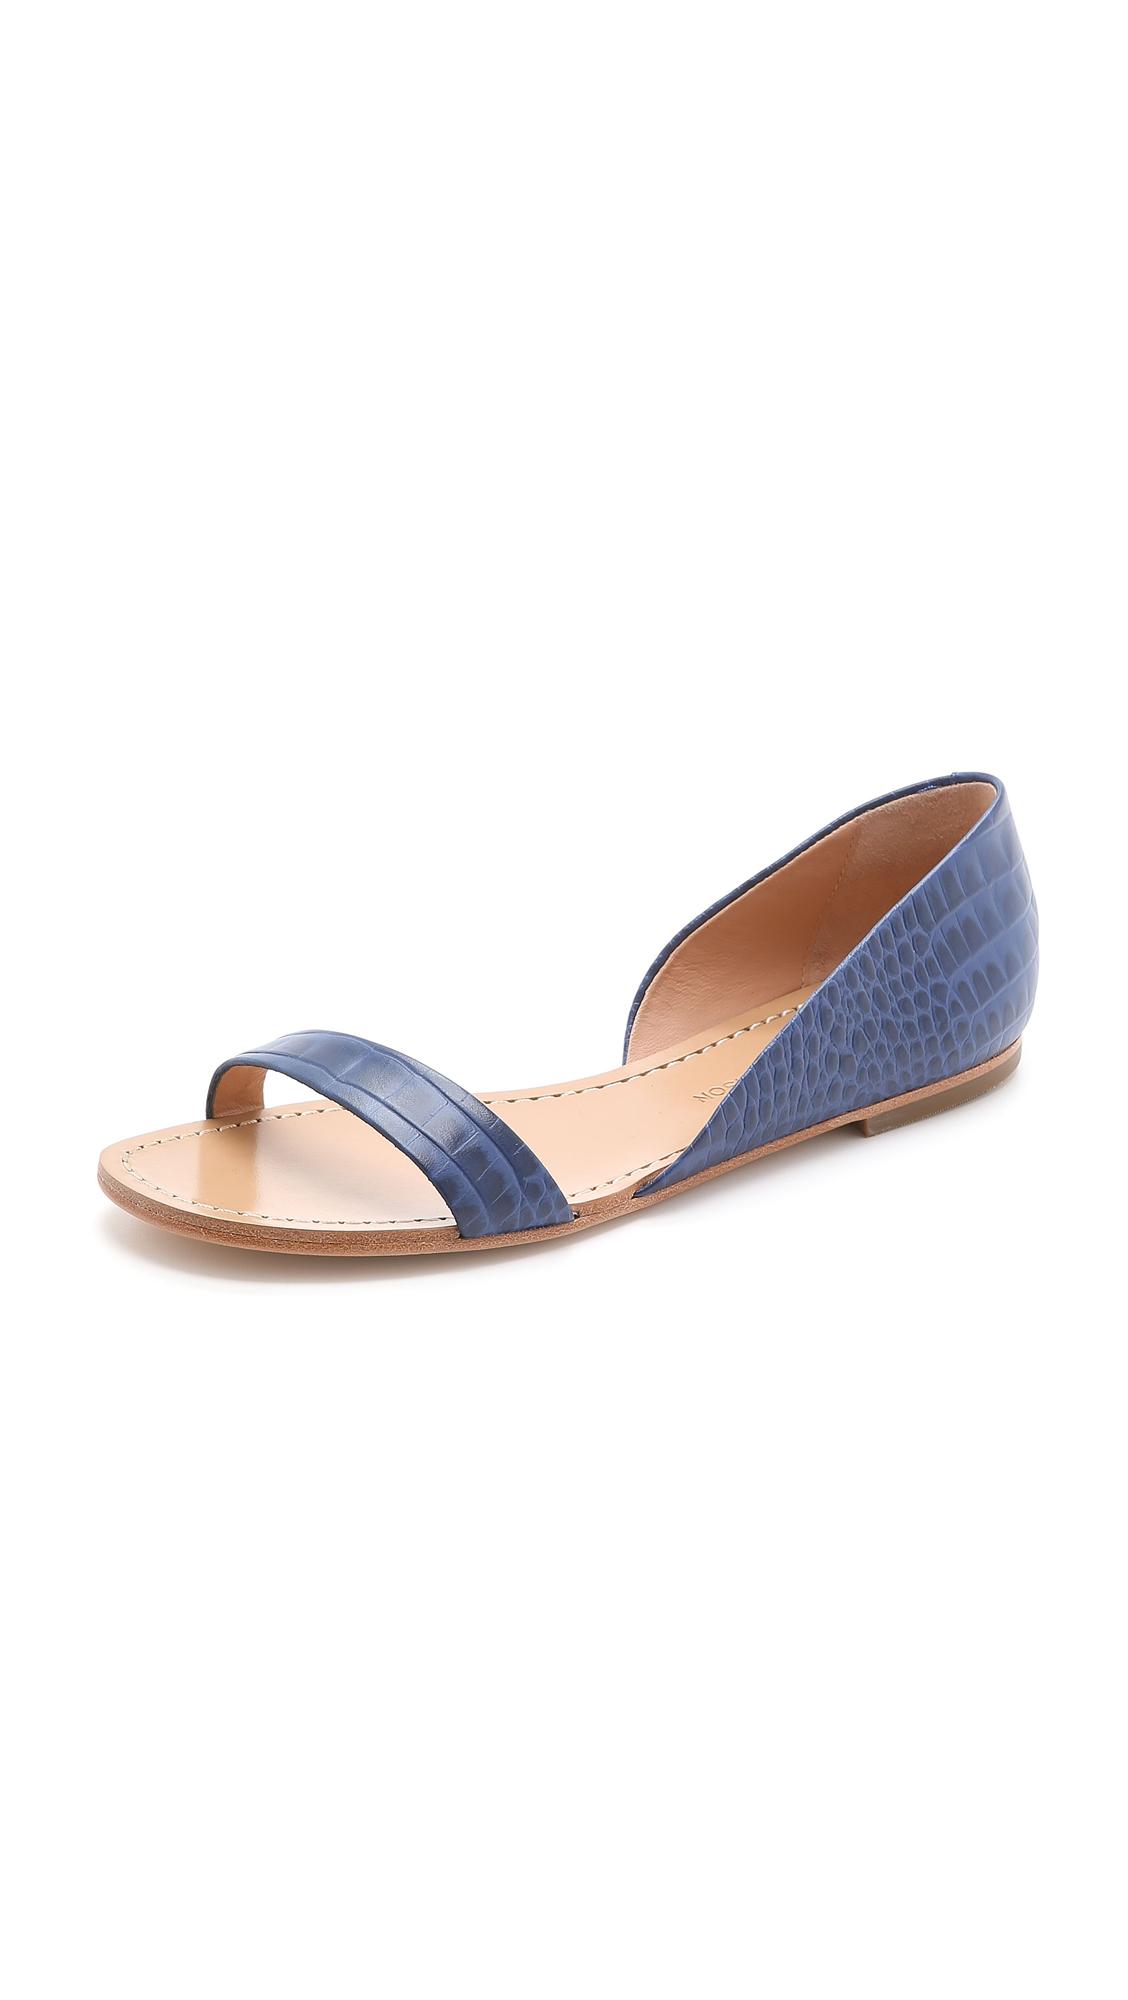 a2b13da7b407 Lyst - Sigerson Morrison Kameda Flat Sandals - Navy in Blue